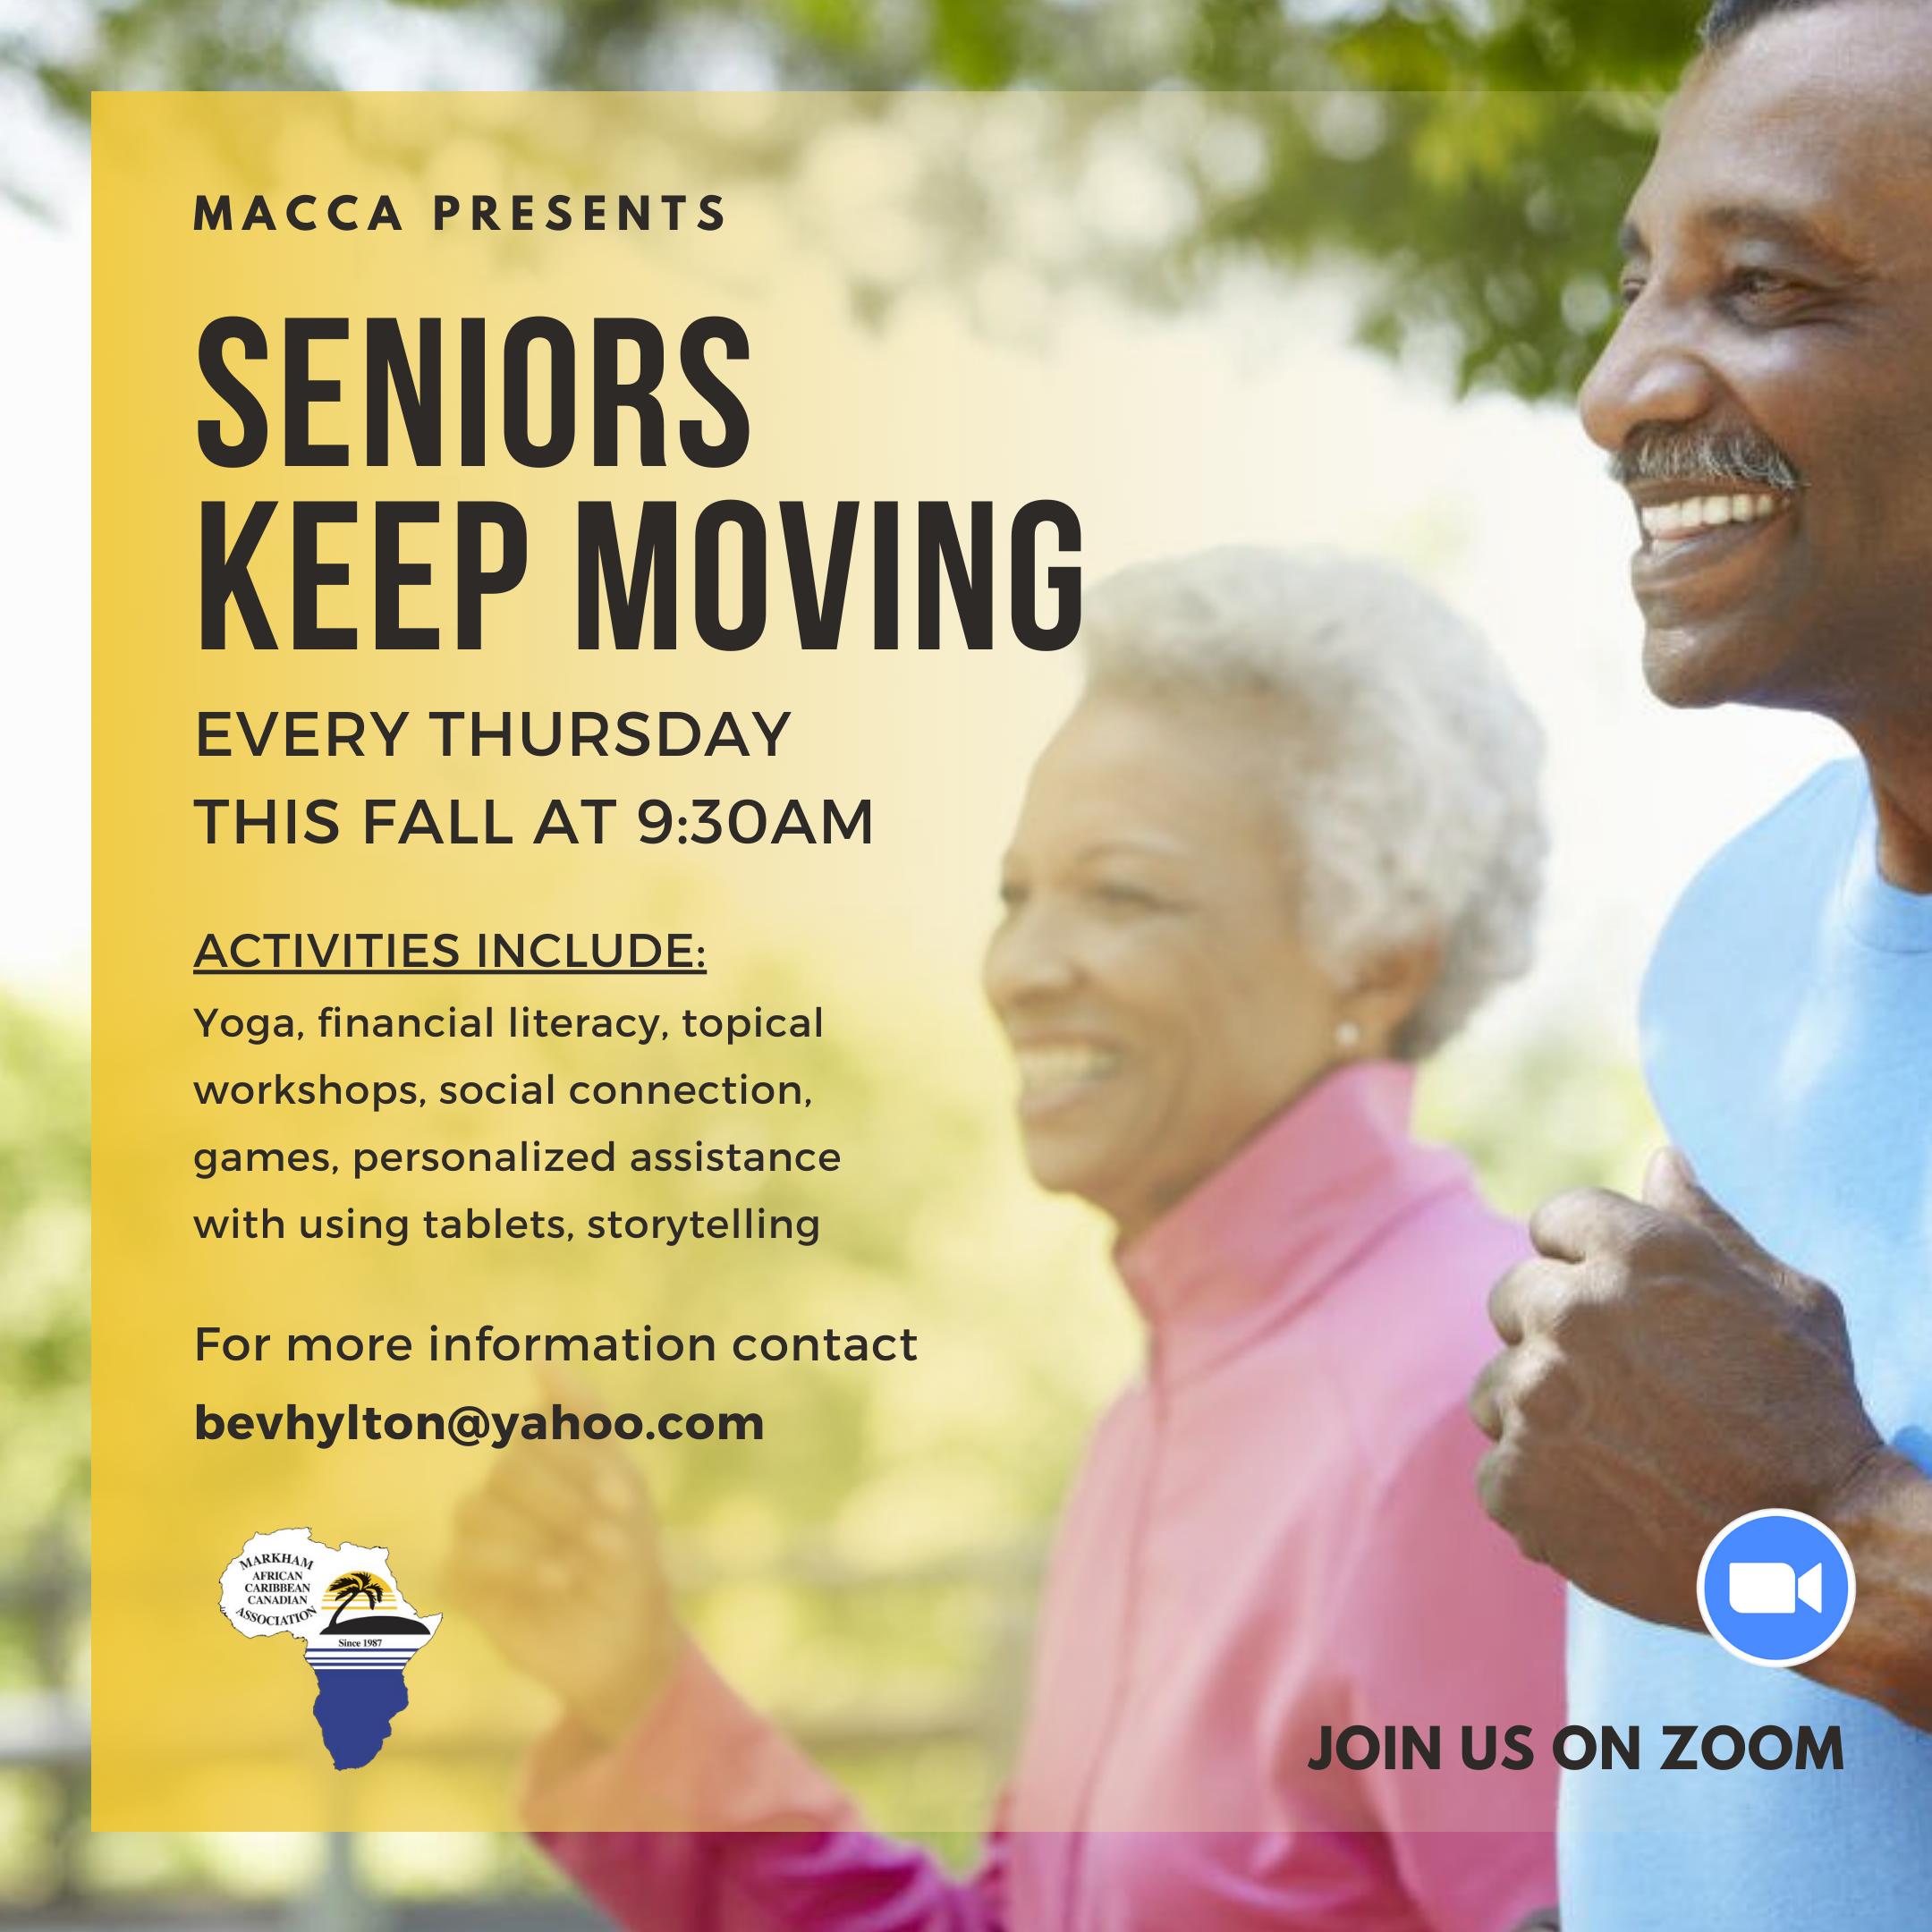 Flyer for Fall programs for Seniors Keep Moving